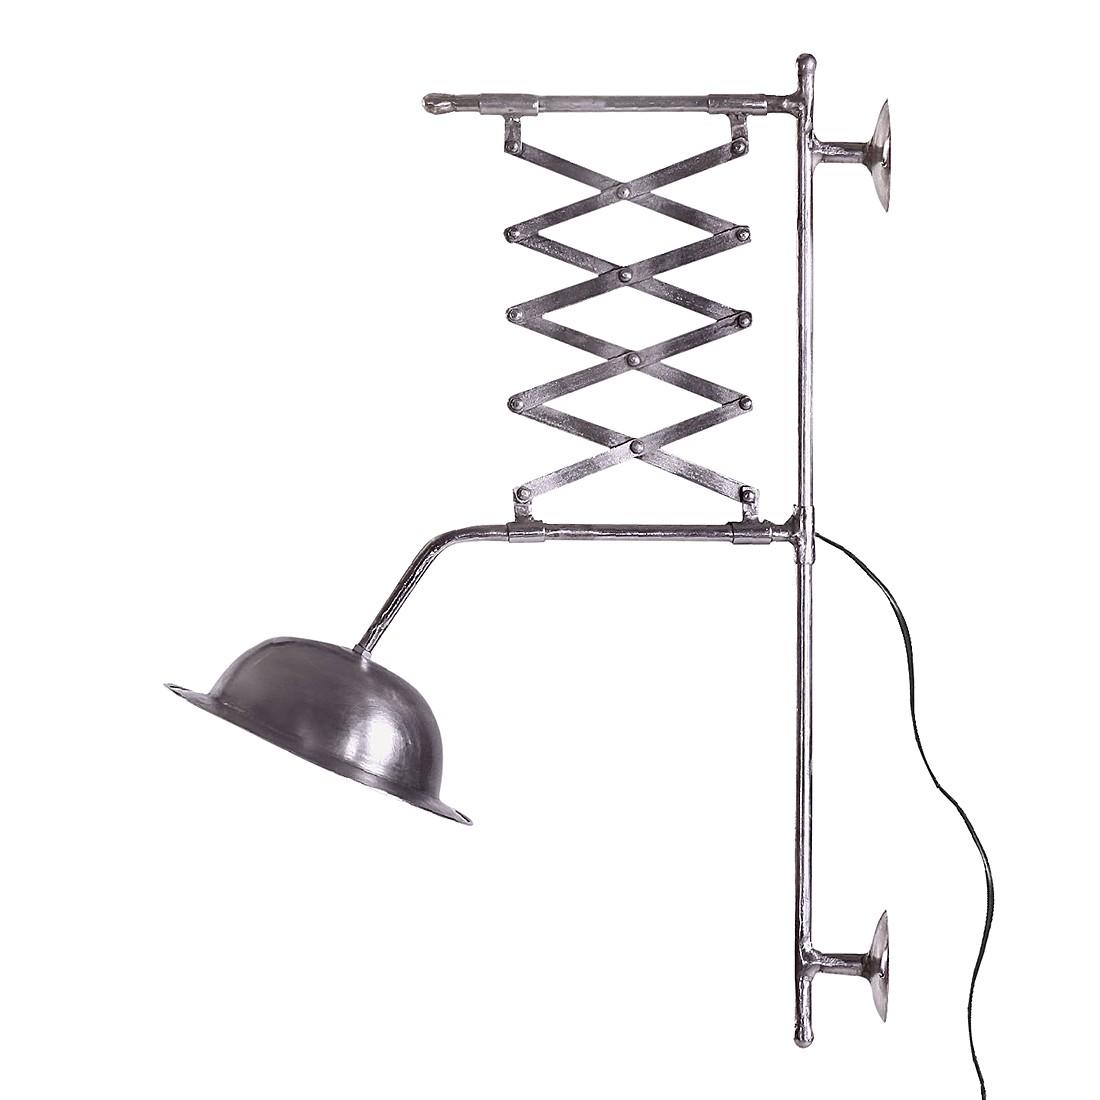 Wandlampe Vanha - Eisen - vernickelt - 1-flammig, furnlab